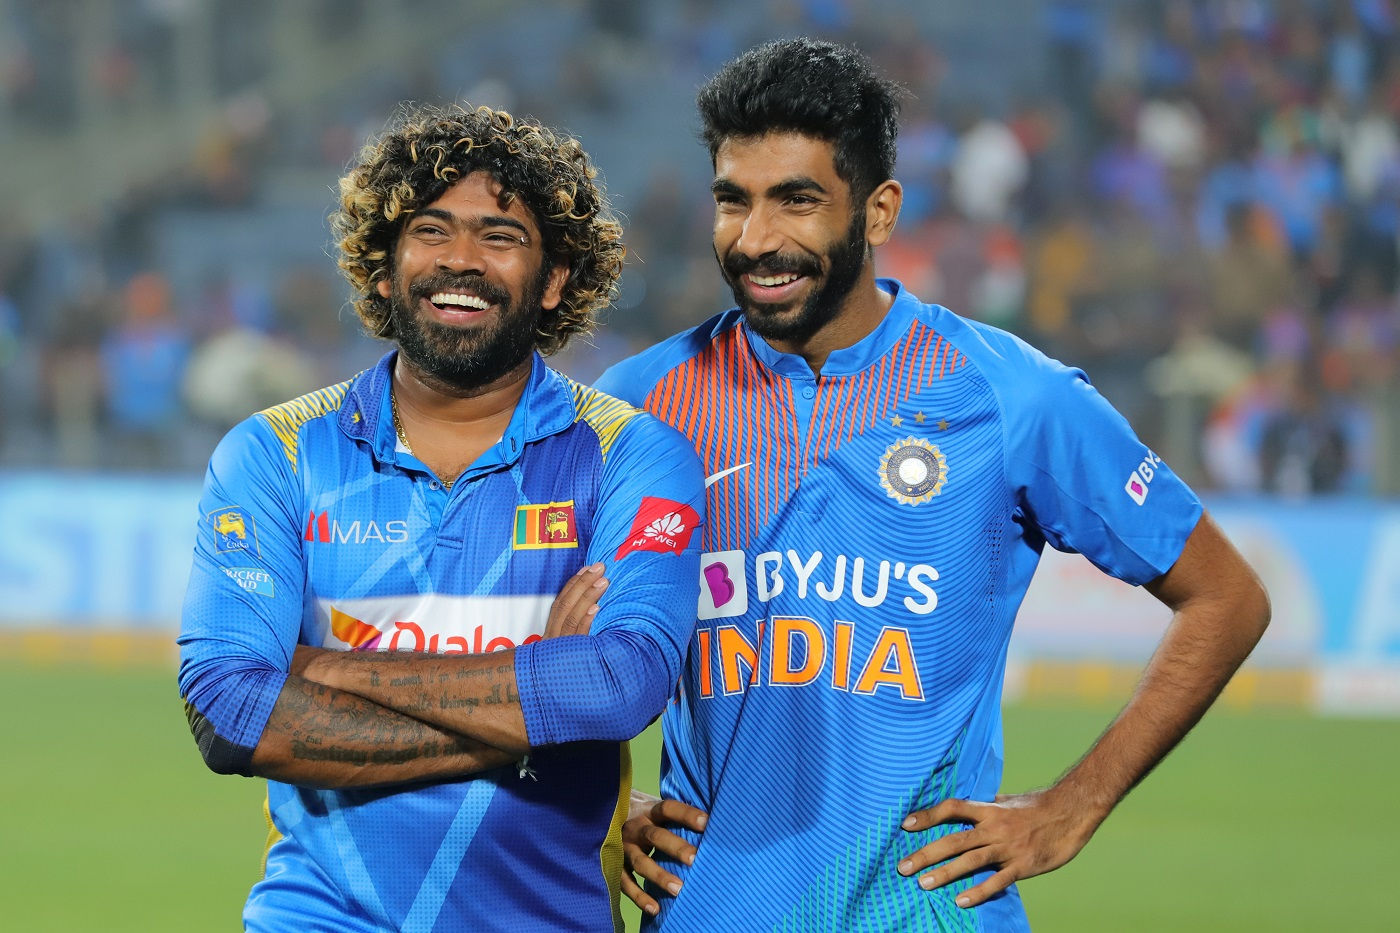 Lasith Malinga and Jasprit Bumrah share a smile after the game | Photo | Global | ESPNcricinfo.com